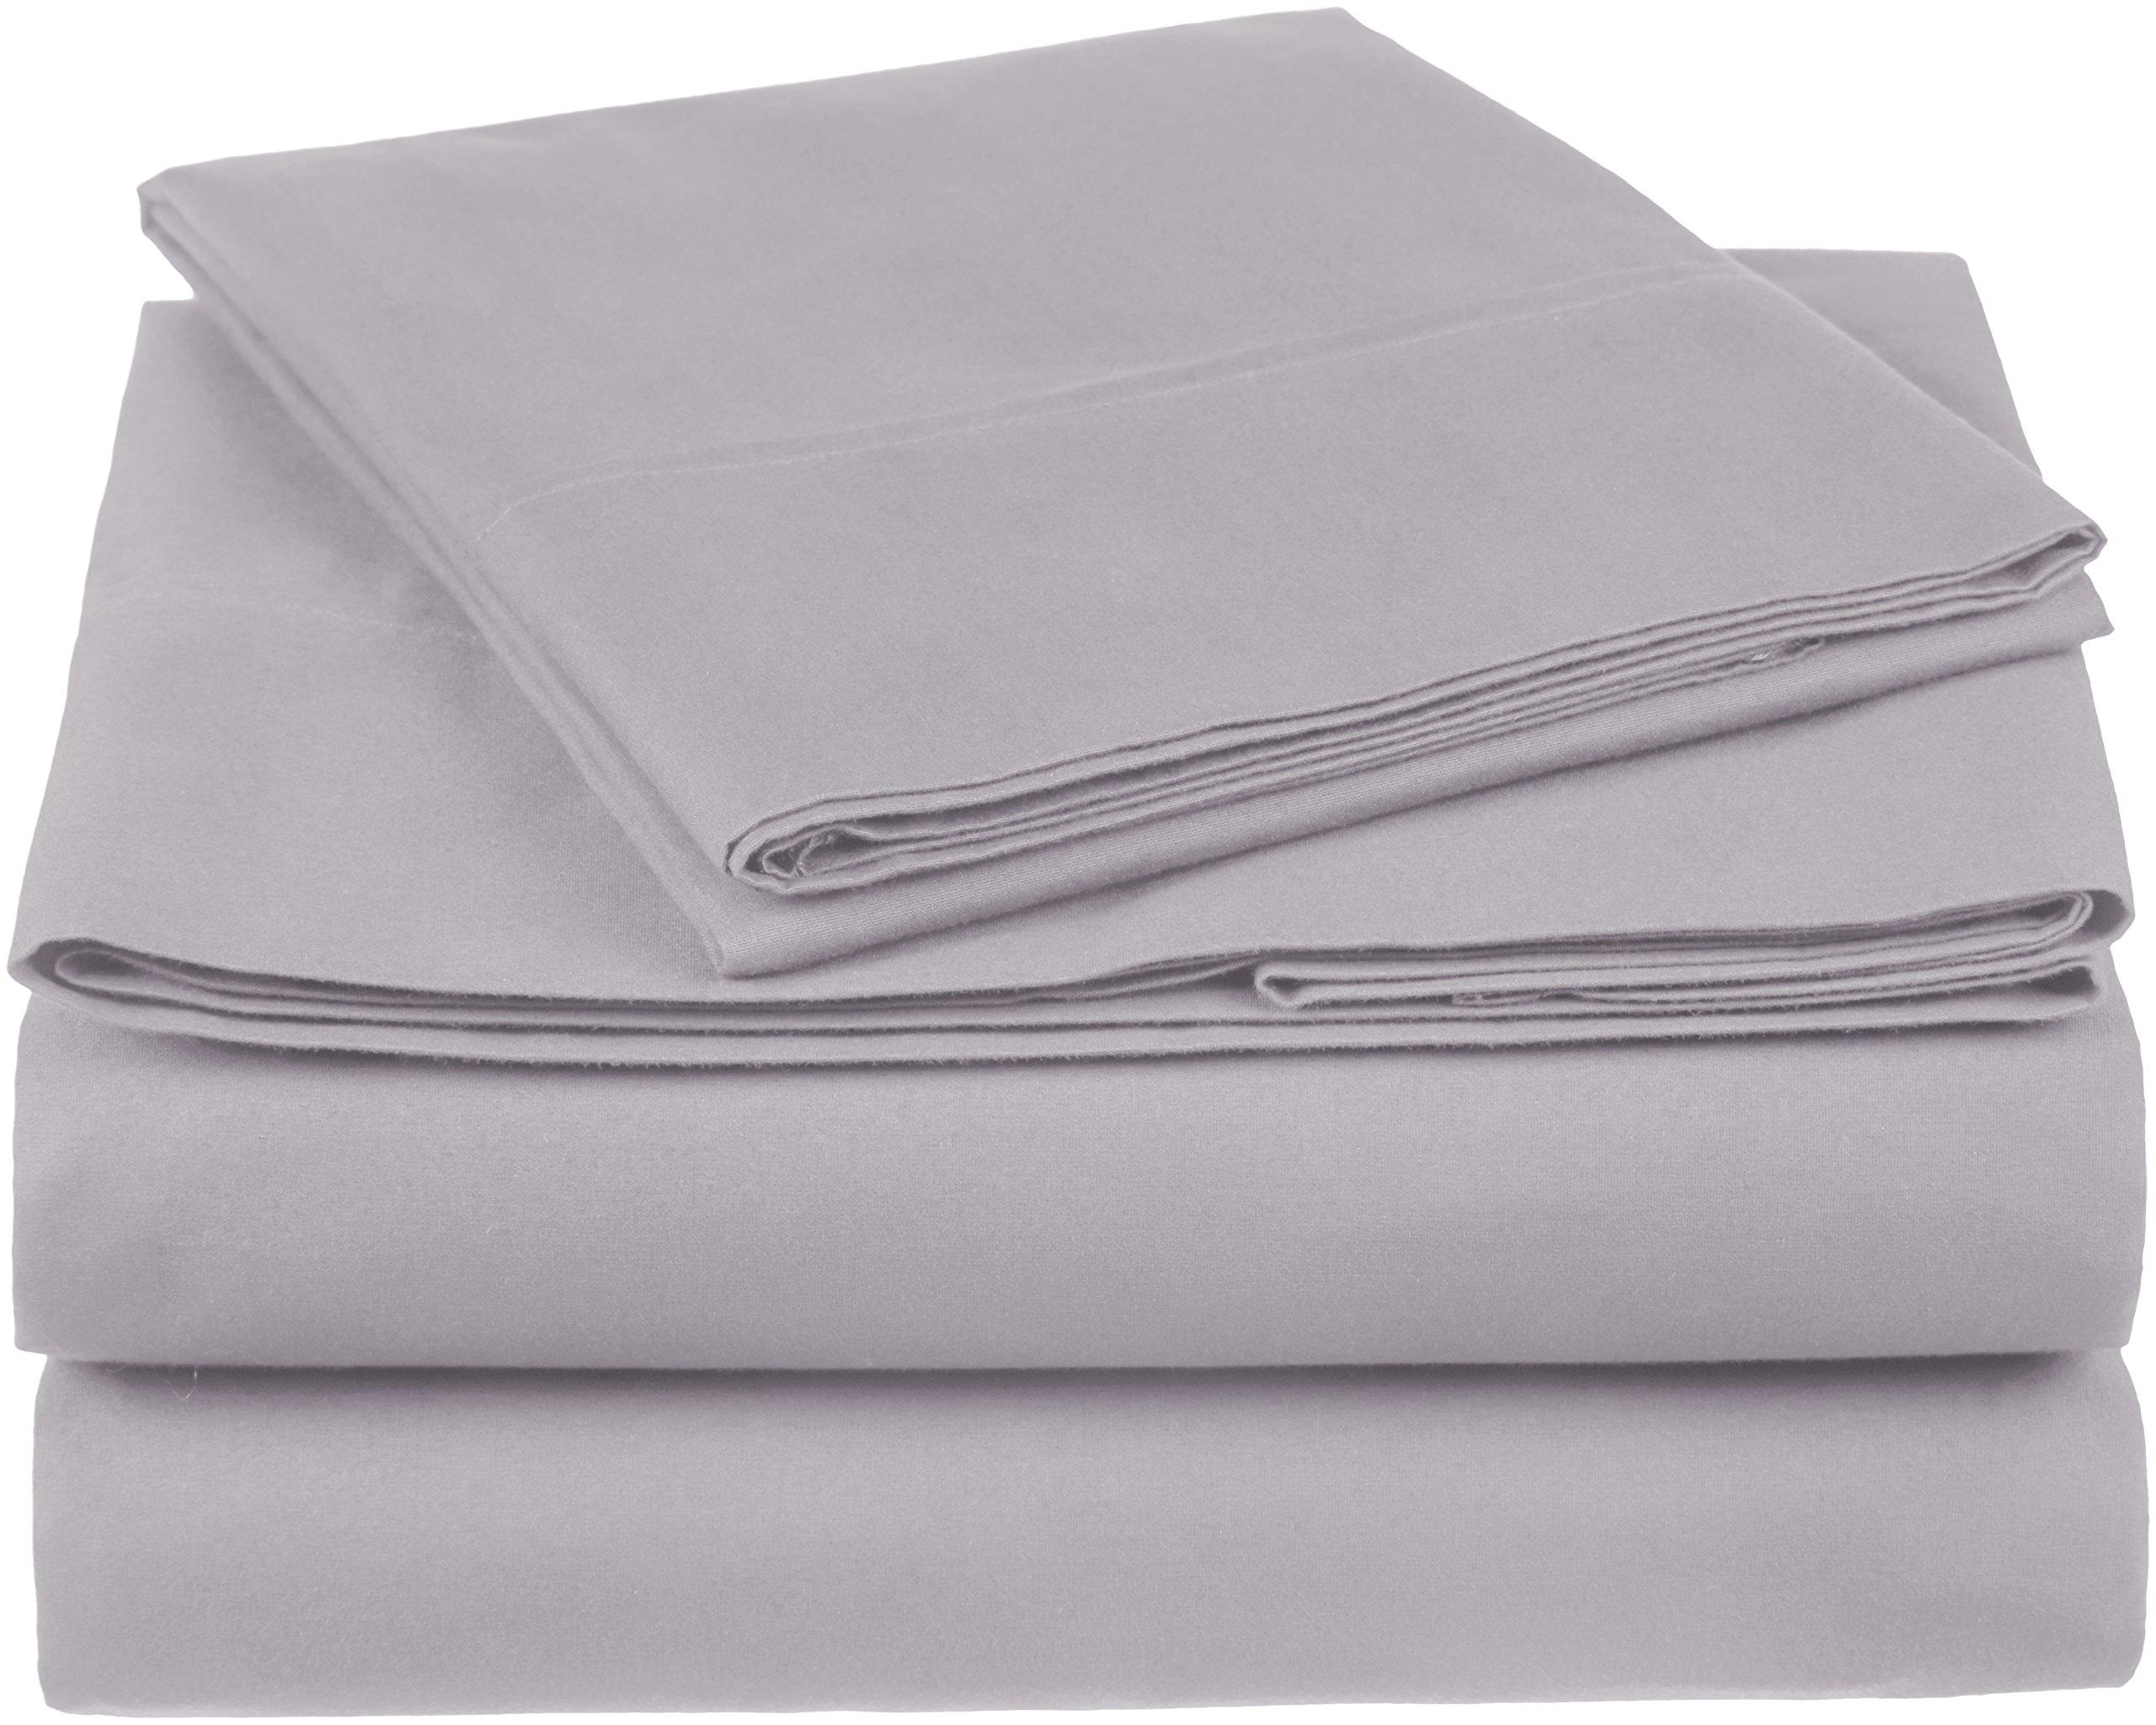 Pinzon 300 Thread Count Organic Cotton Sheet Set - Twin, Dove Grey